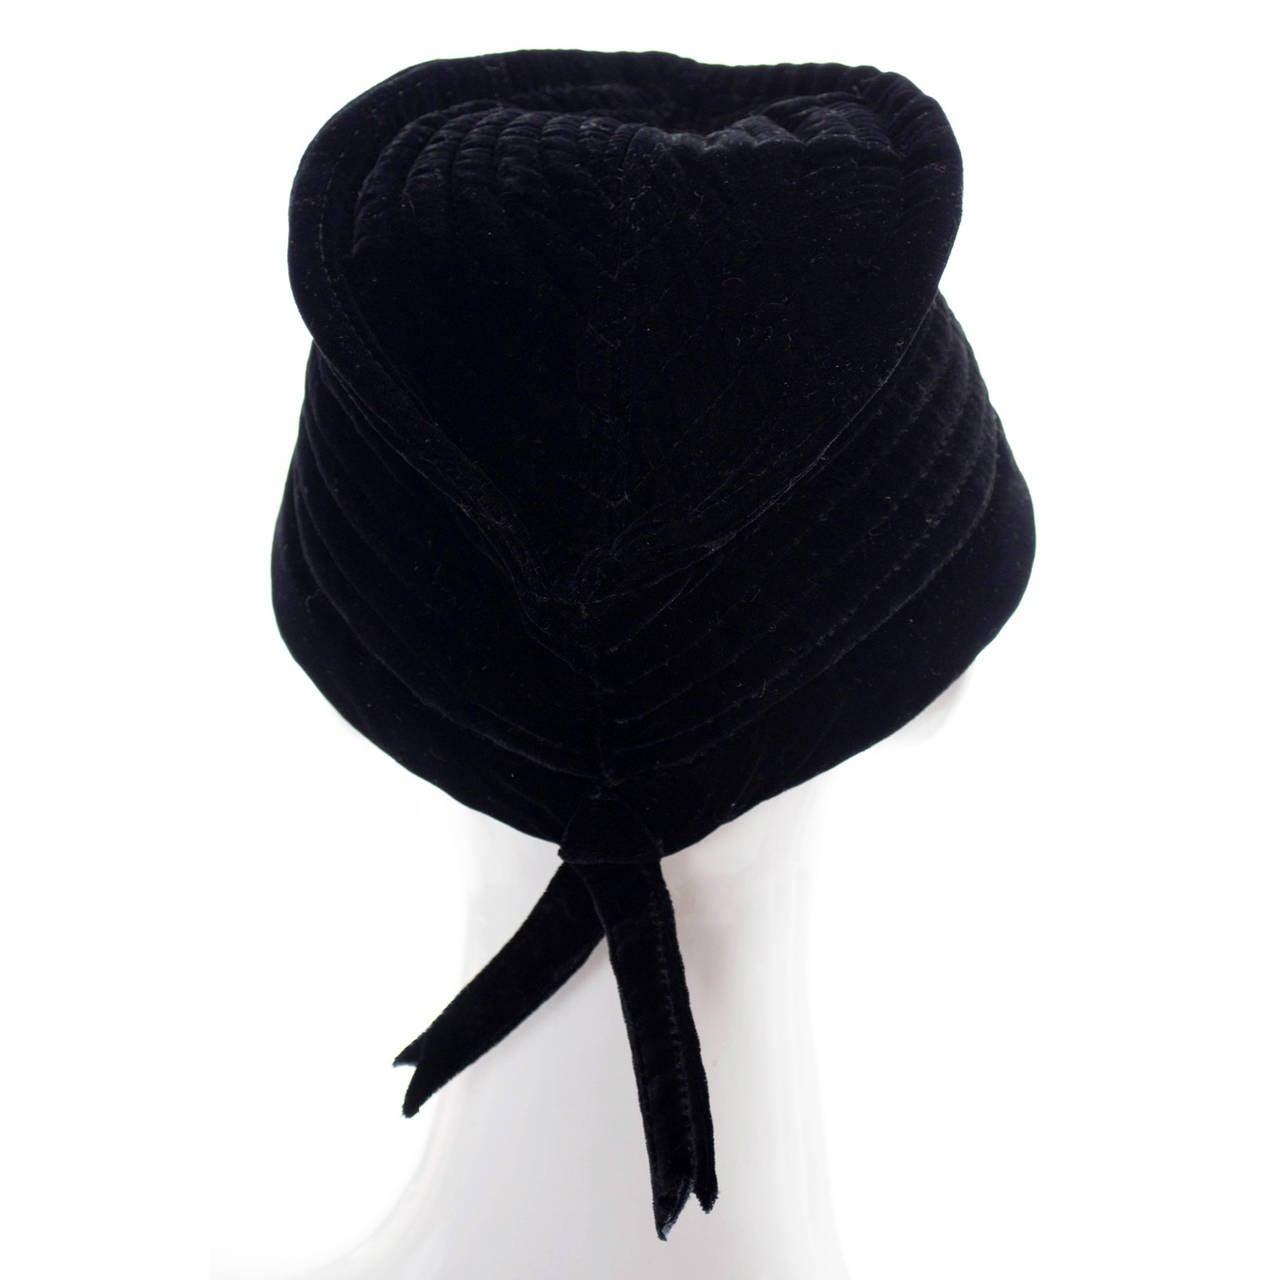 Vintage Valentino Garavani Boutique Vintage Hat Designer Velvet Cap 3